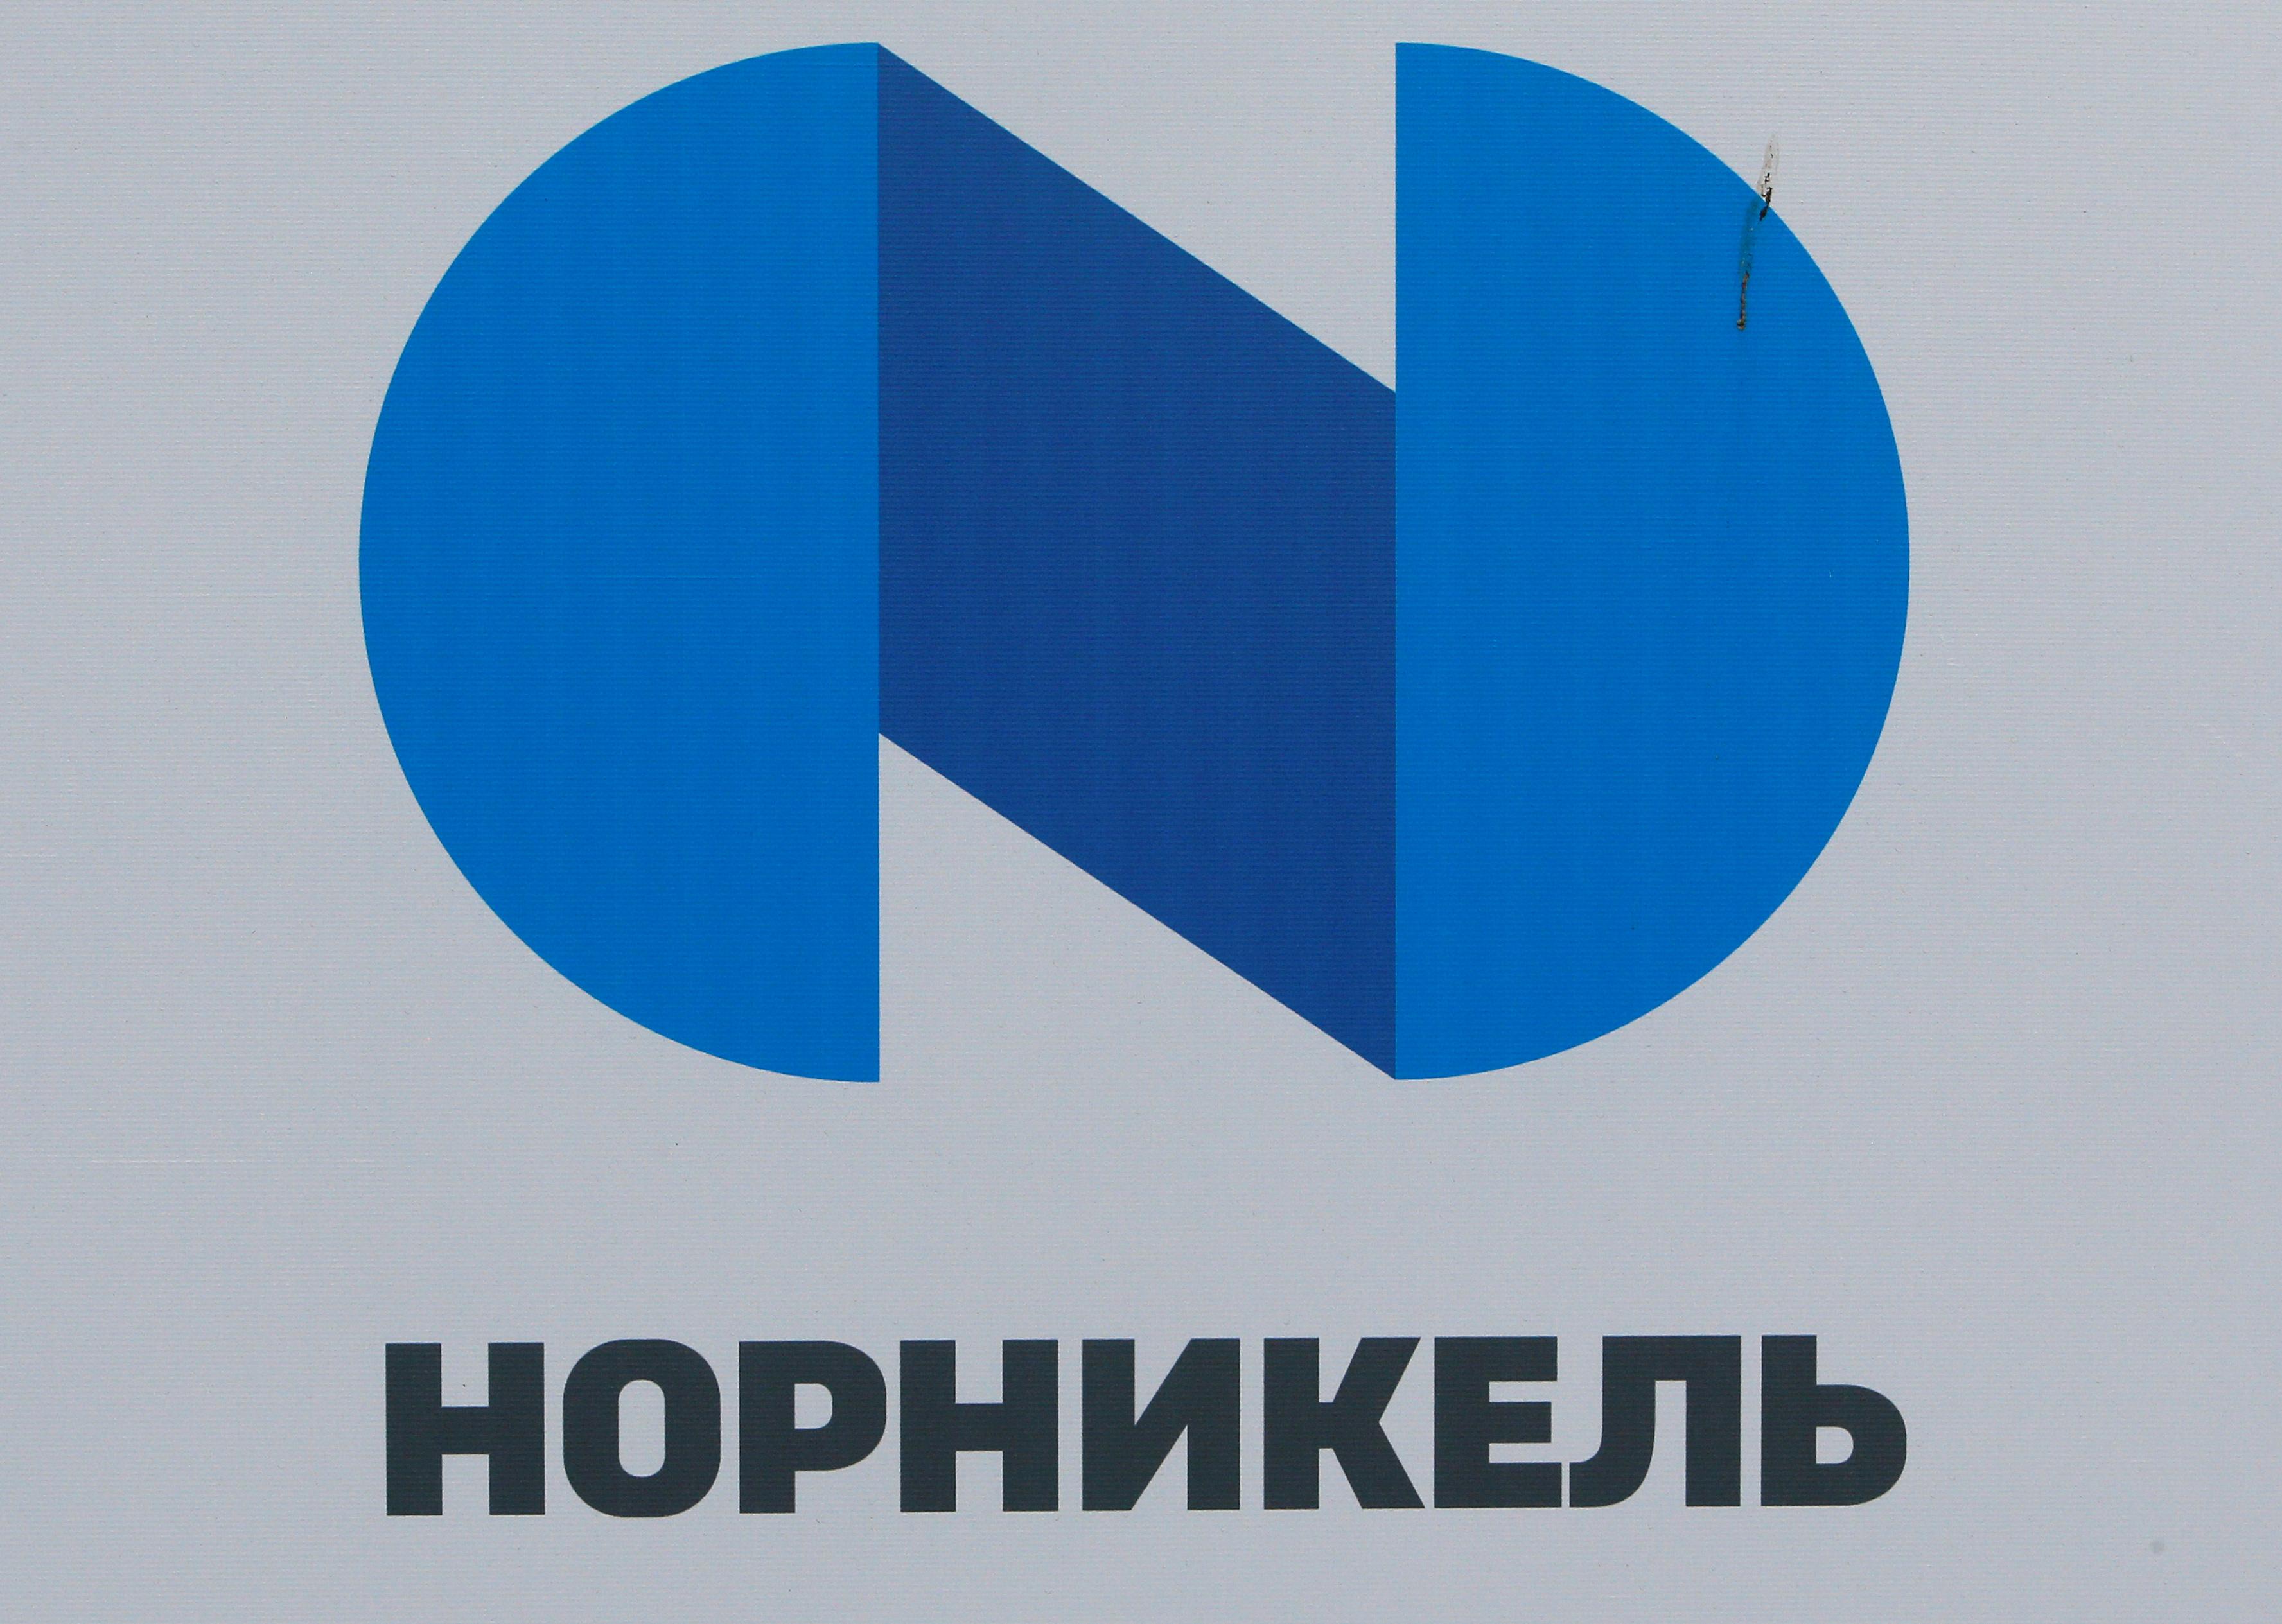 The logo of Russia's miner Norilsk Nickel (Nornickel) is seen on a board at the St. Petersburg International Economic Forum 2017 (SPIEF 2017) in St. Petersburg, Russia, June 1, 2017. REUTERS/Sergei Karpukhin/File Photo